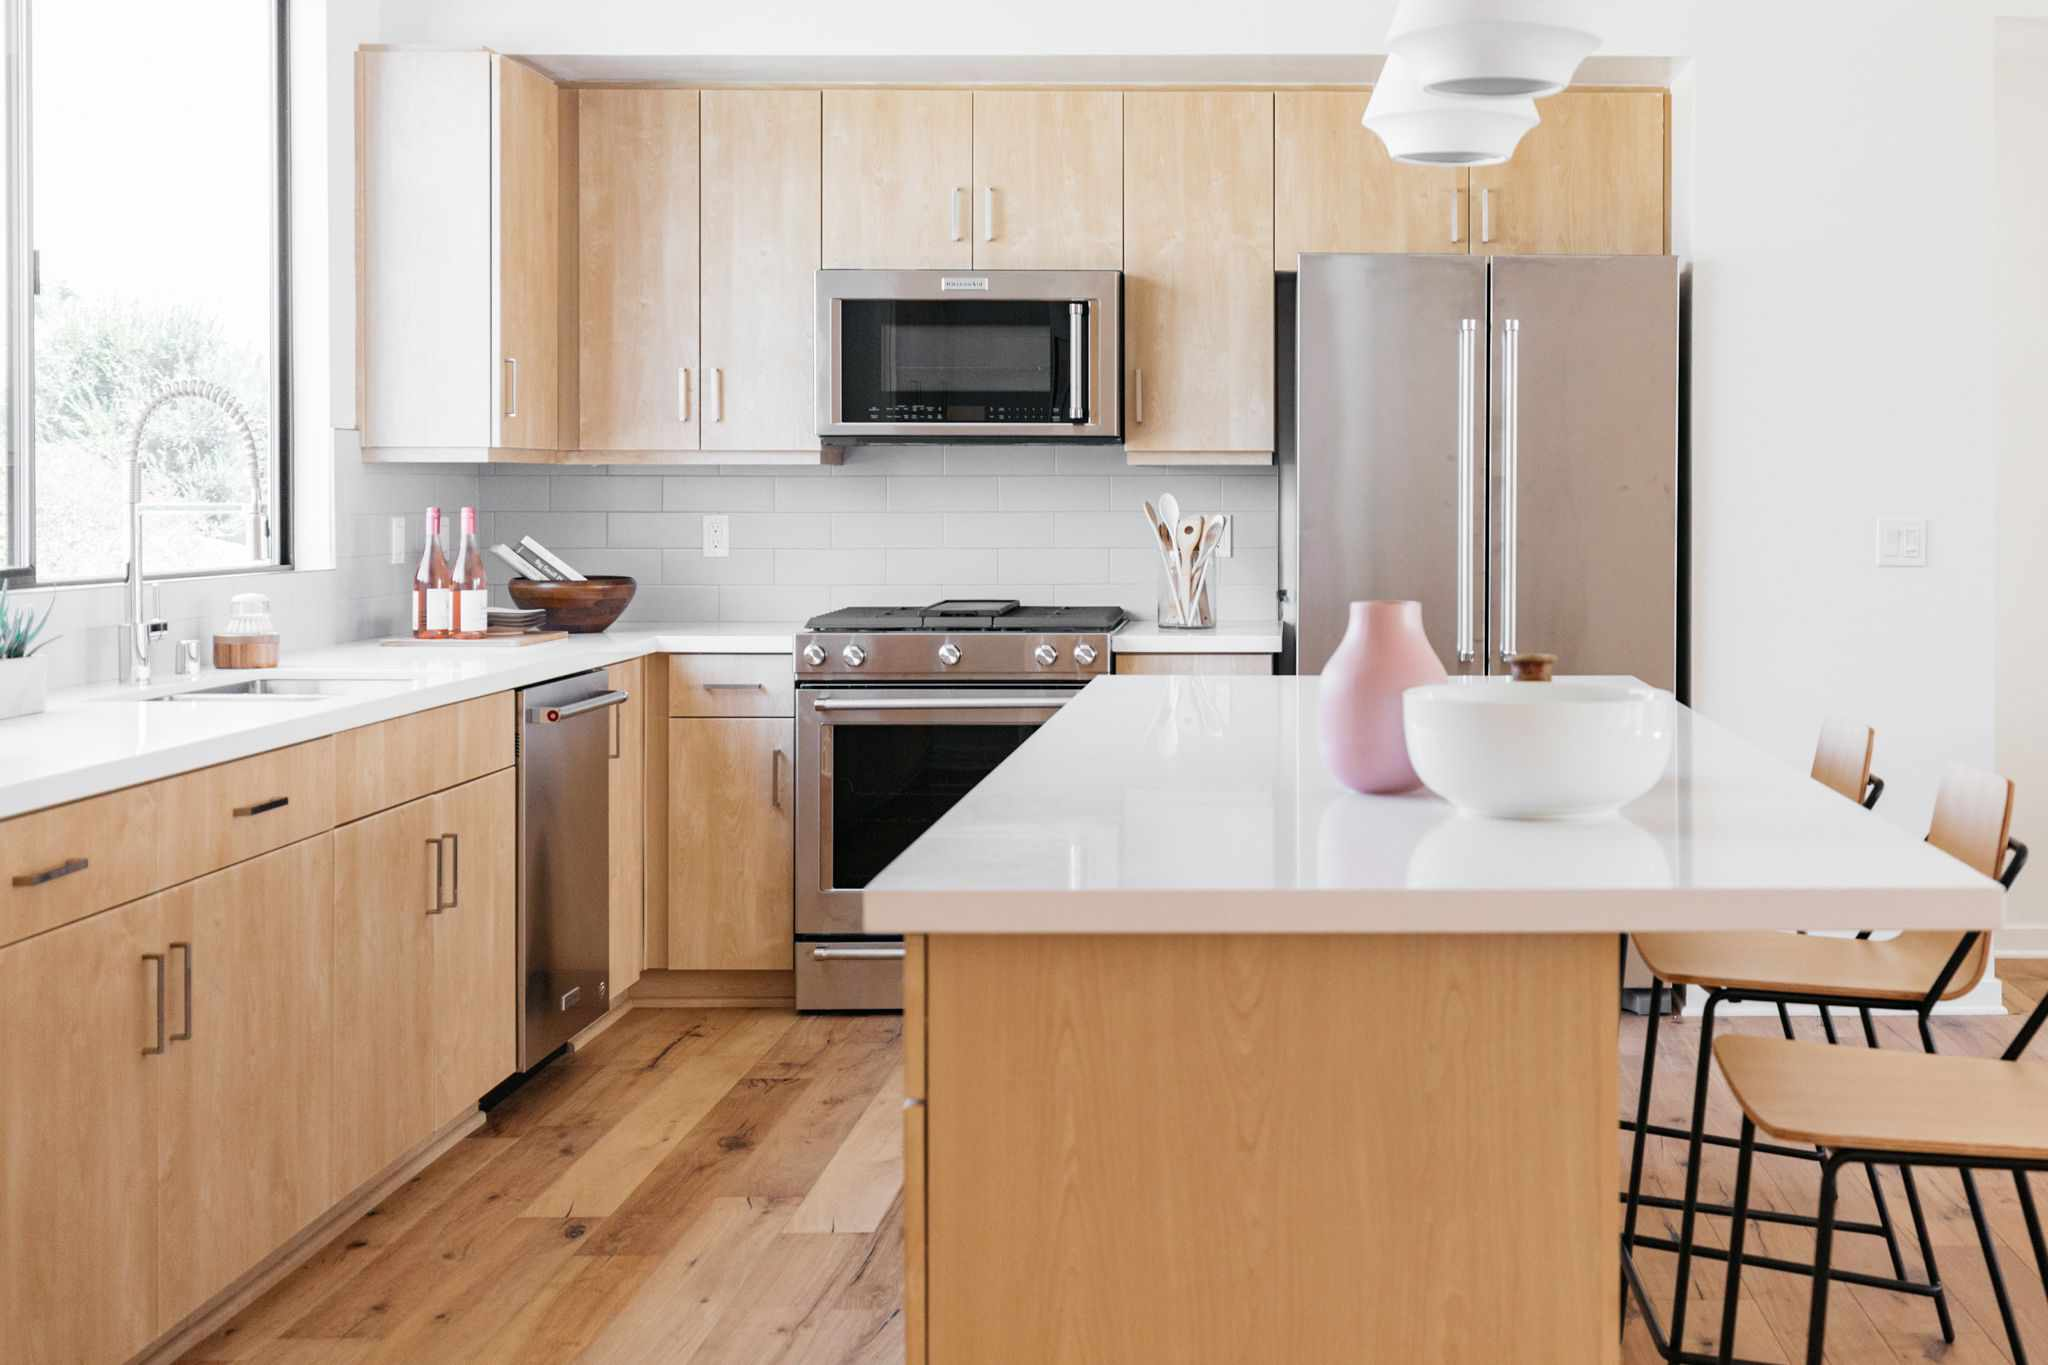 hardwood flooring in a kitchen